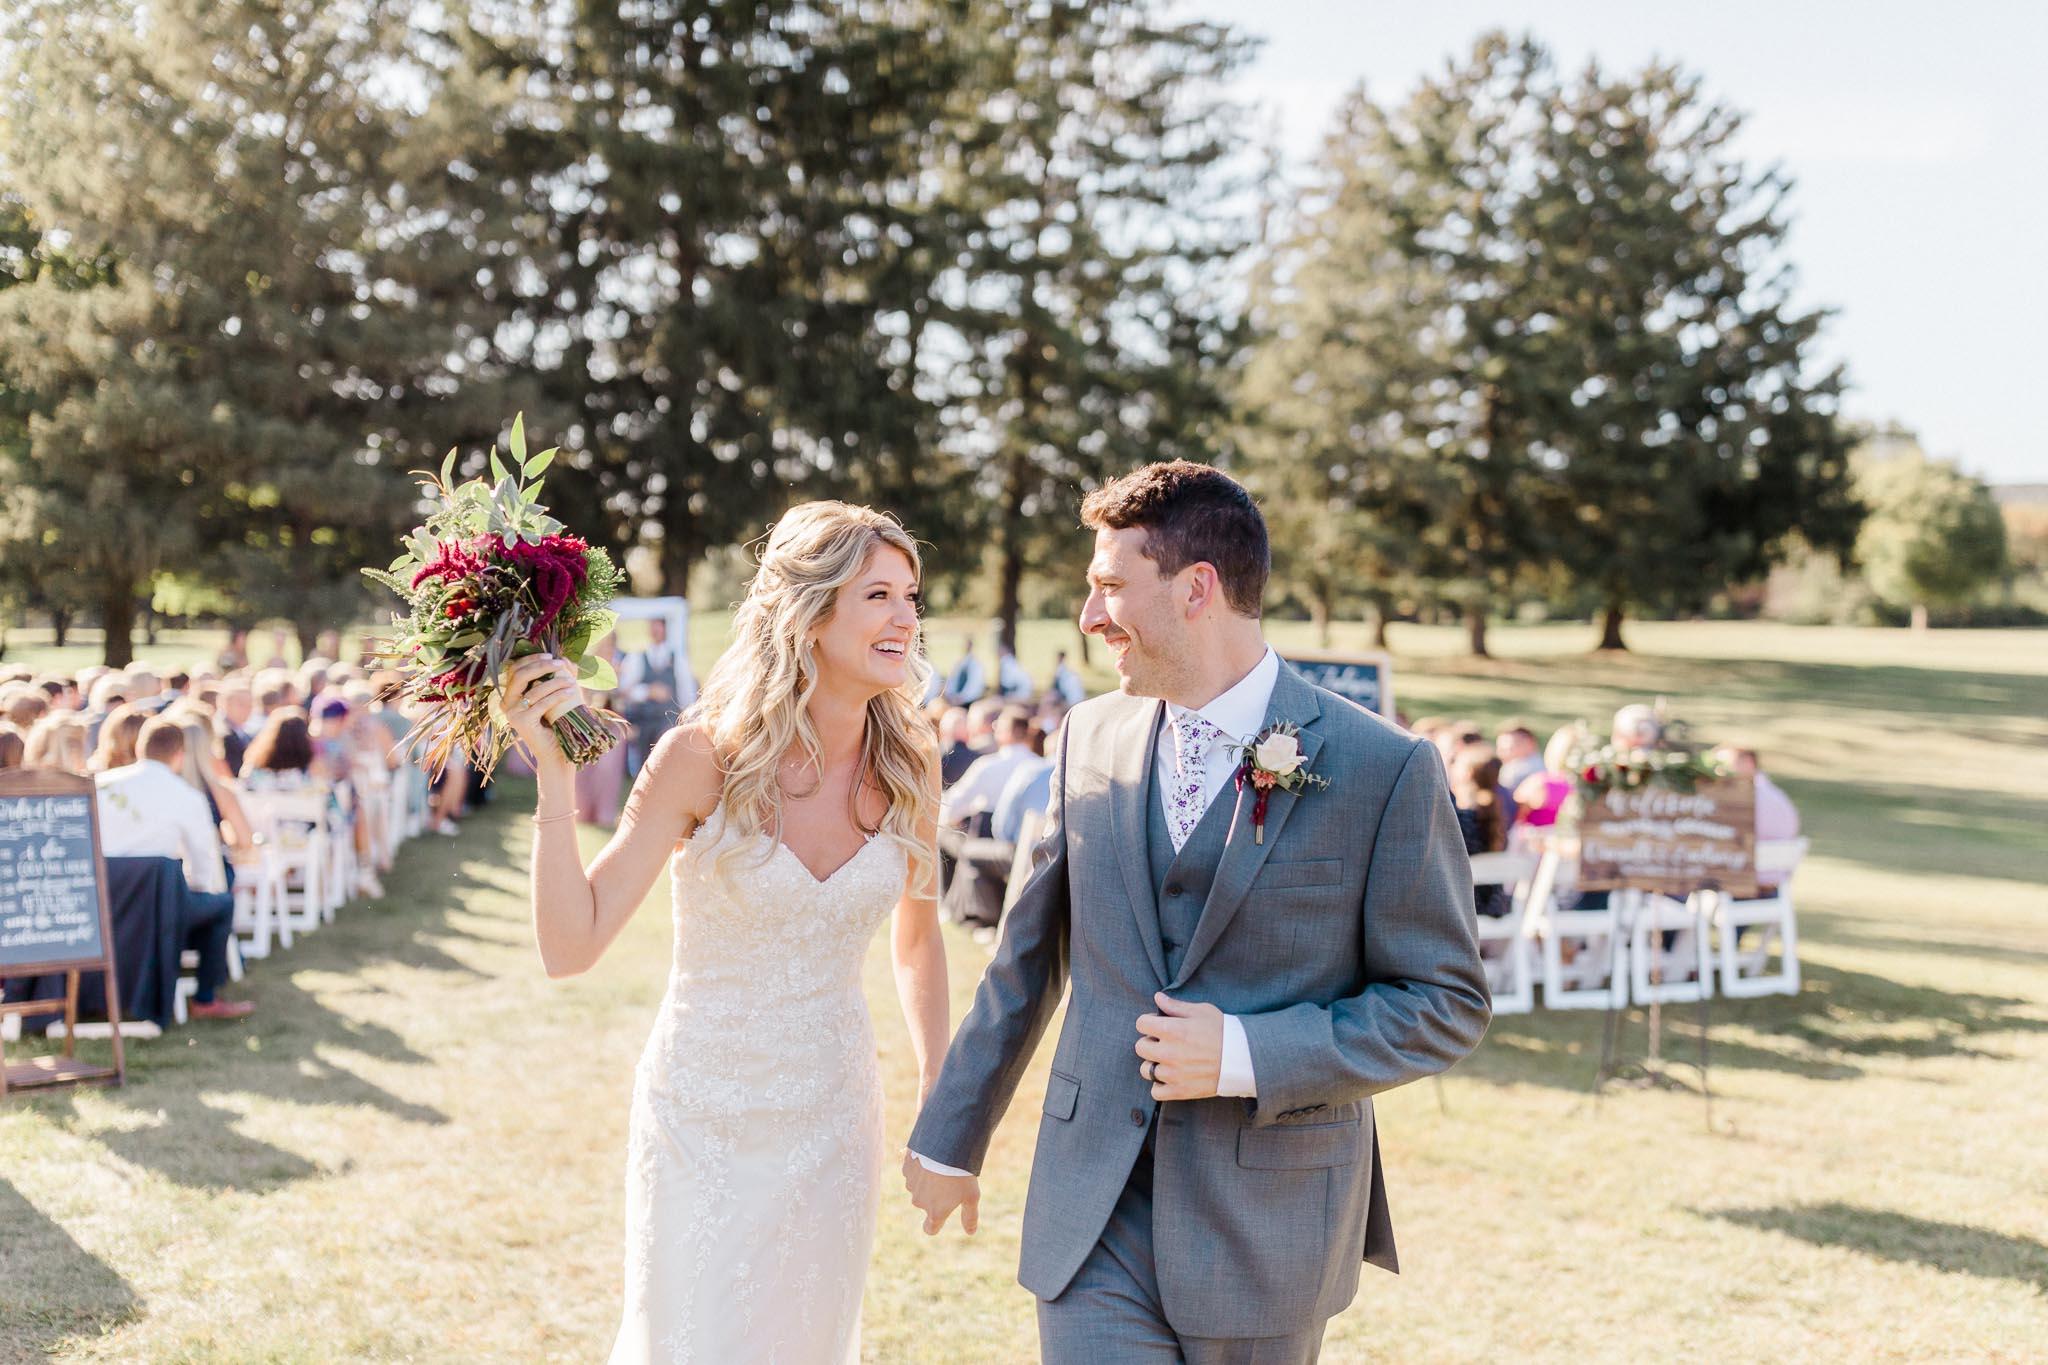 Frosty-Valley-September-Wedding-7770.jpg